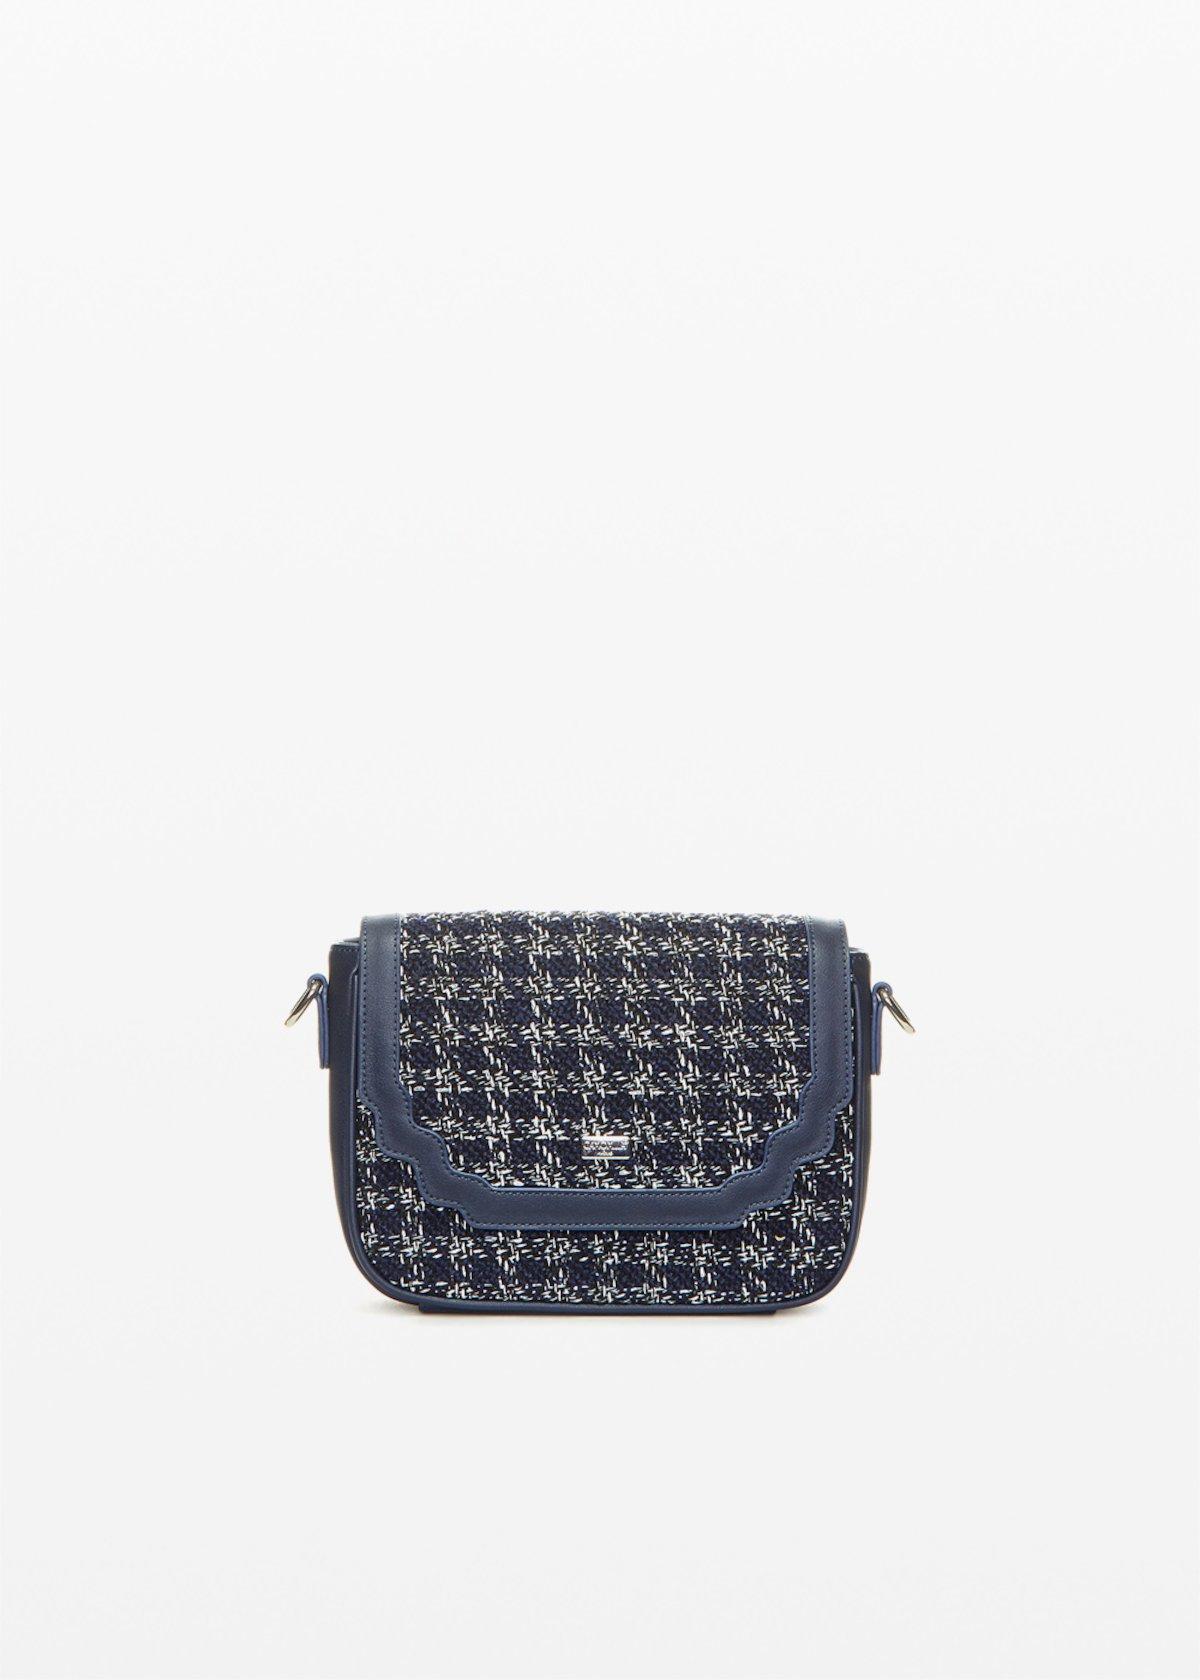 Crossbody bag Bita in ecopelle boucle' effect - Blue / White Fantasia - Donna - Immagine categoria